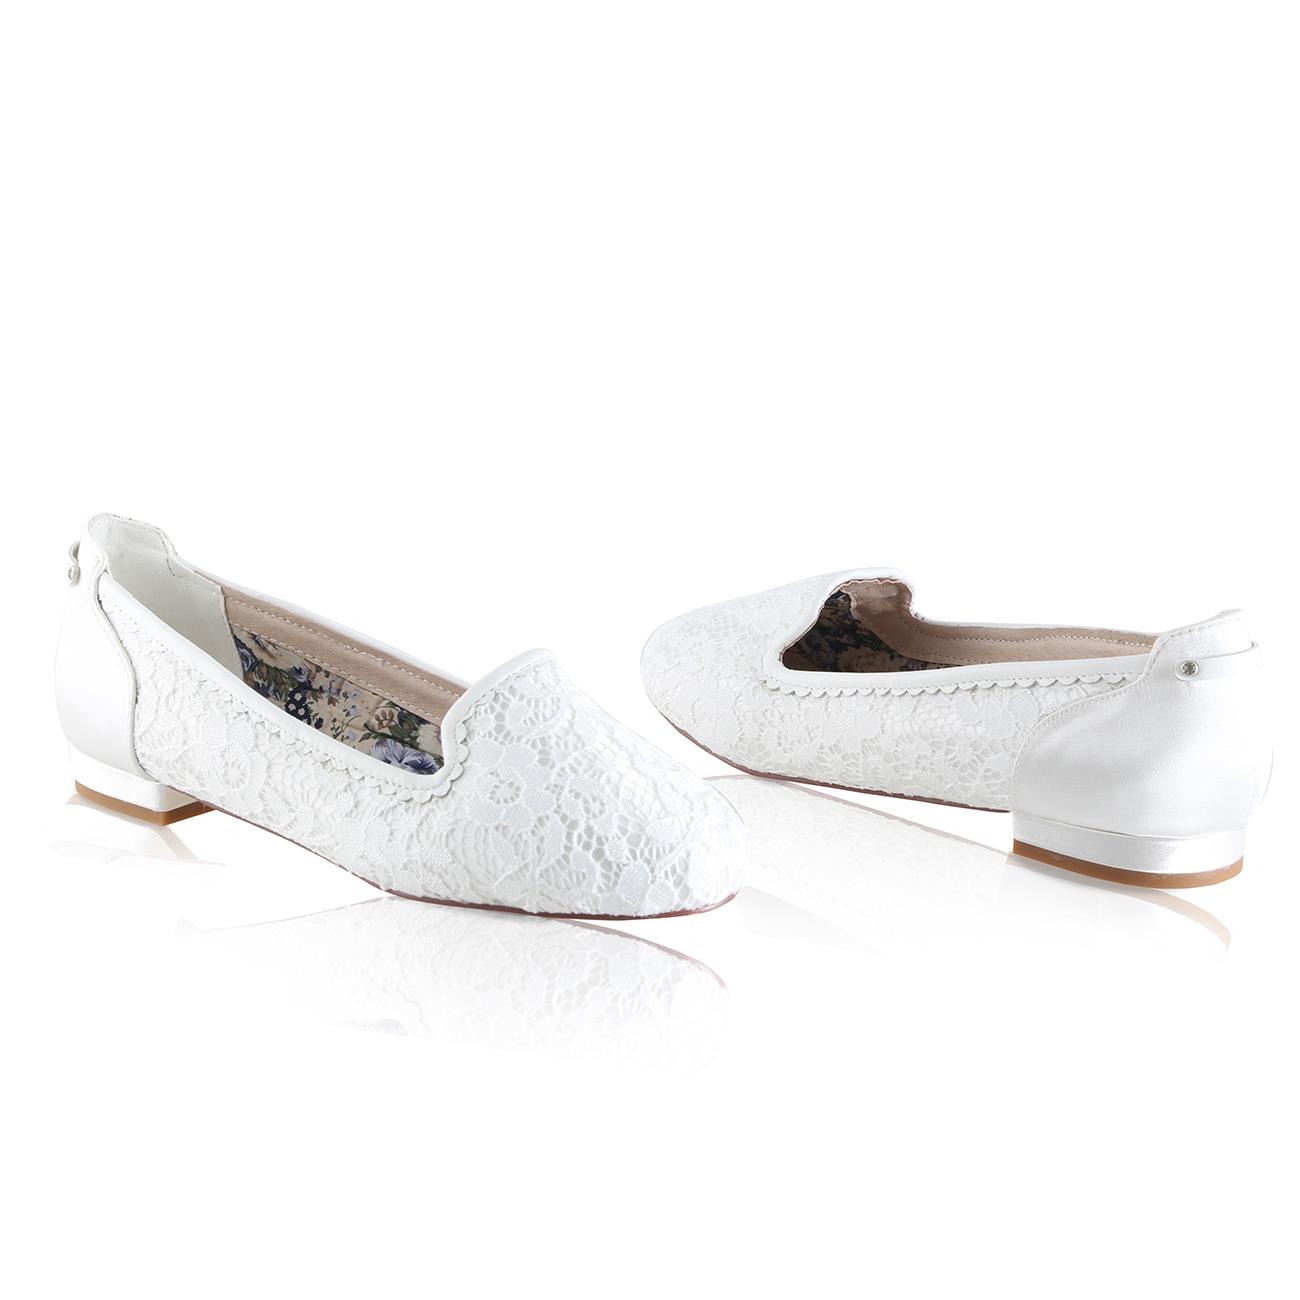 alice lace ivory satin lace overlay bridal slipper shoes